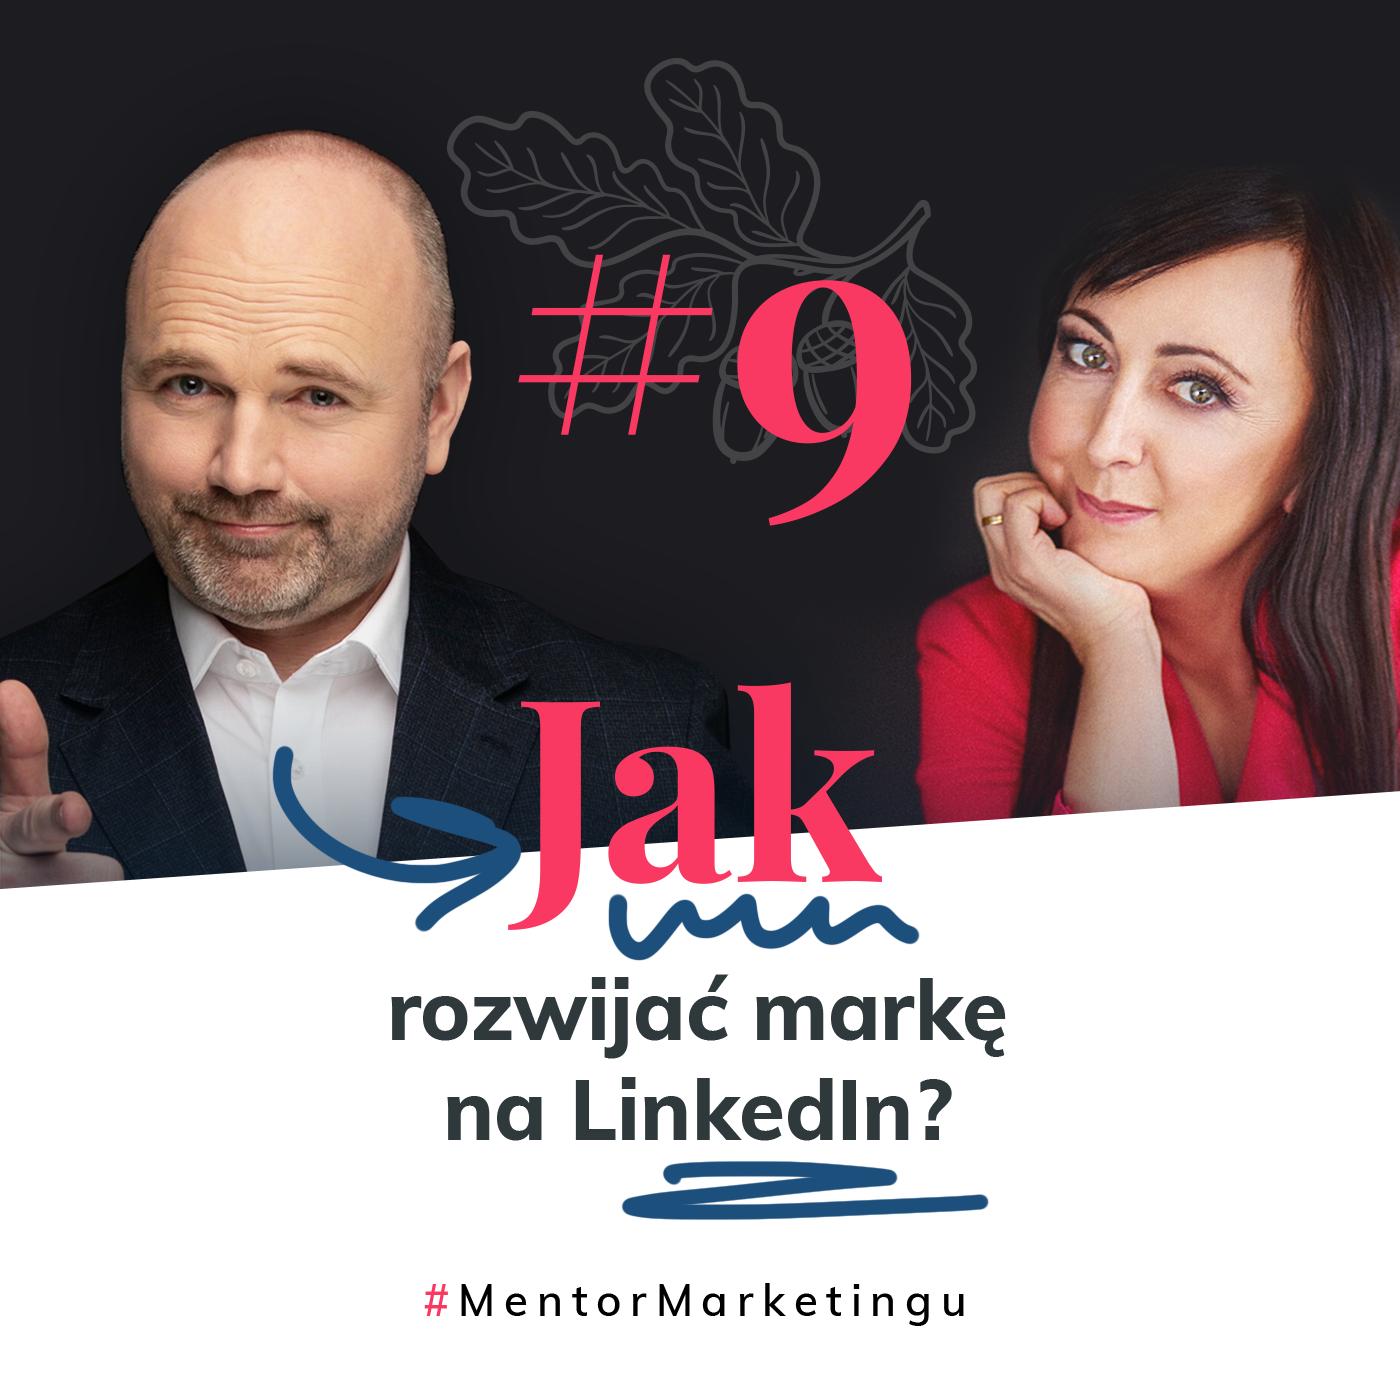 Jak rozwijać markę na LinkedIn?